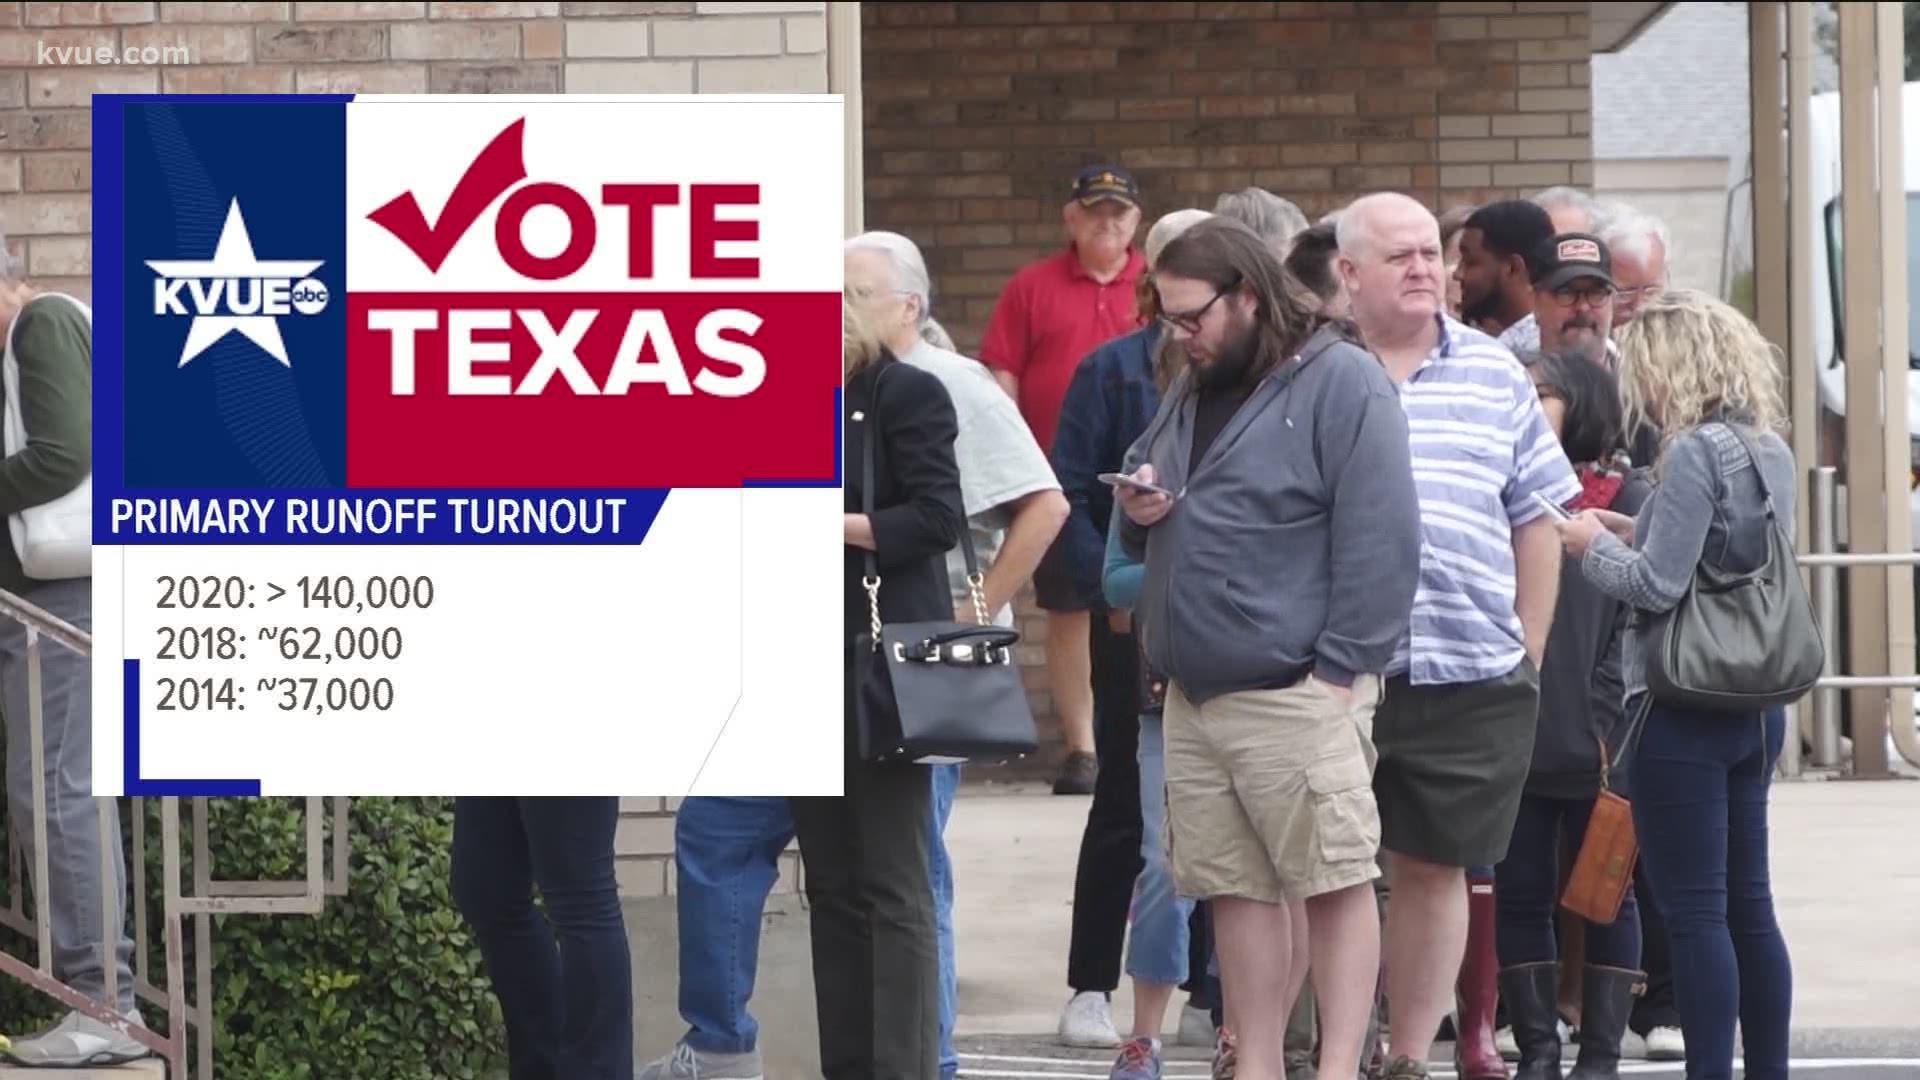 Texas Democratic Primary Runoff Election U S House District 31 Kvue Com